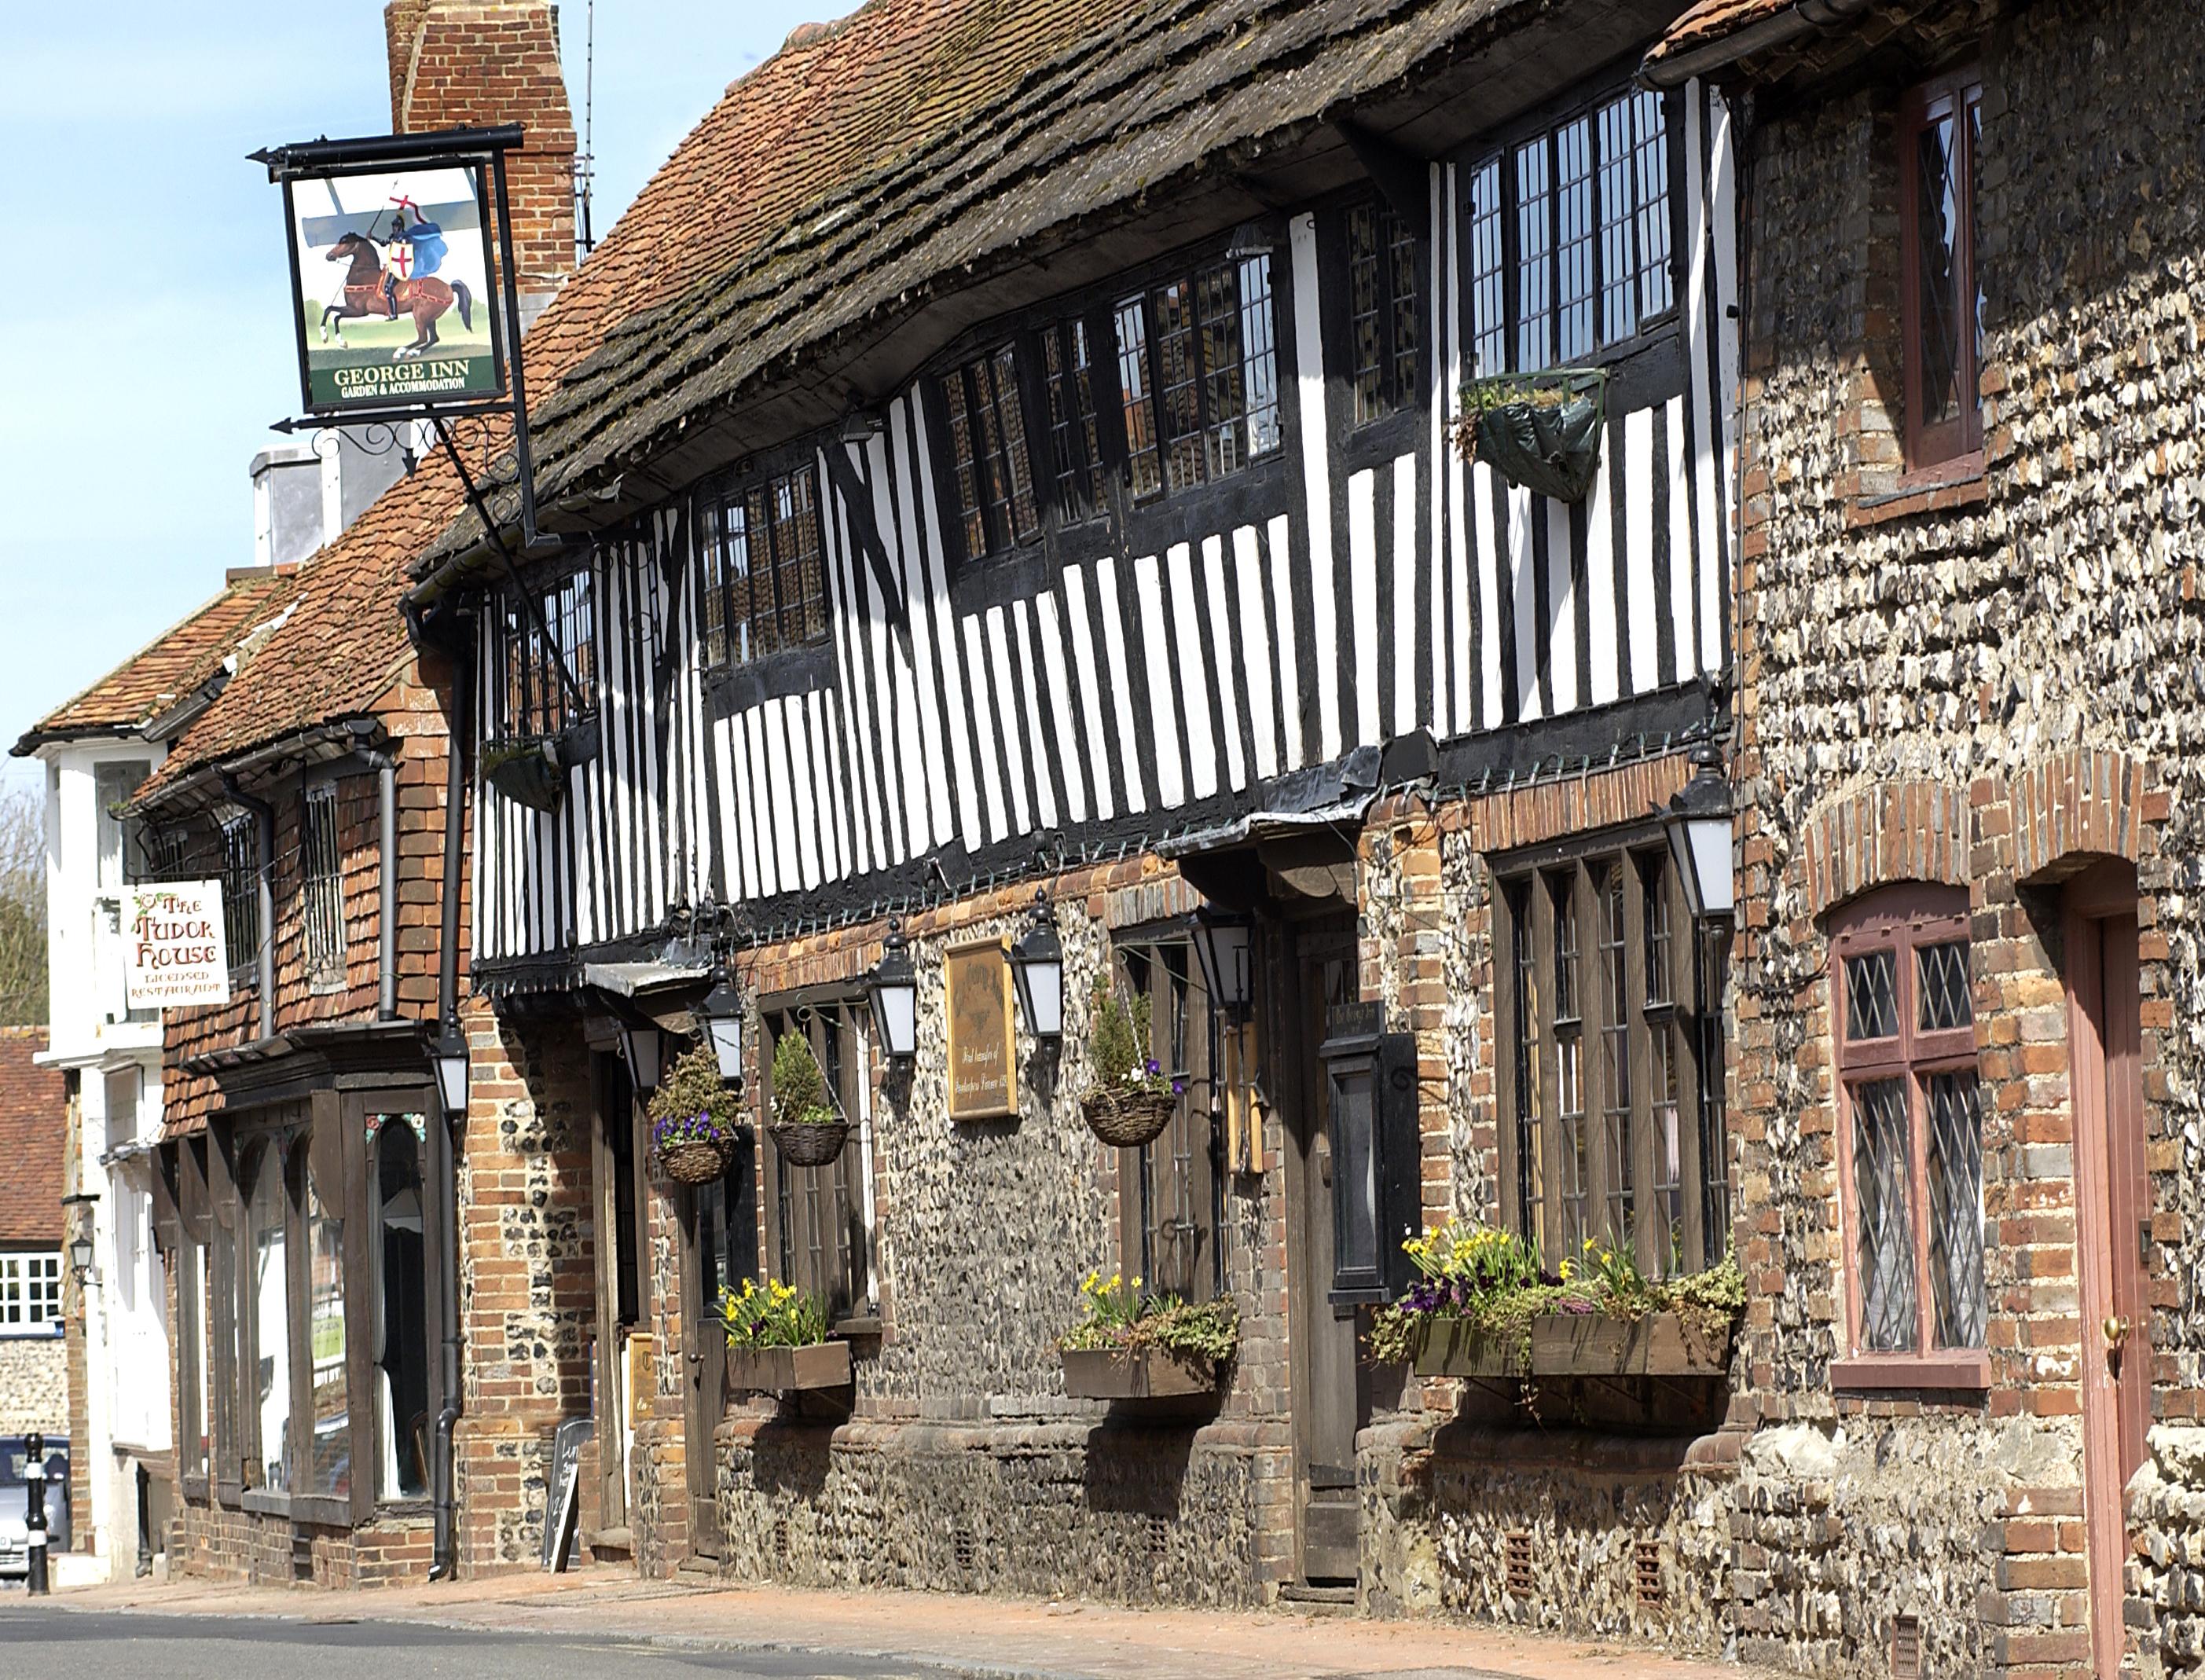 The George Inn, Alfriston